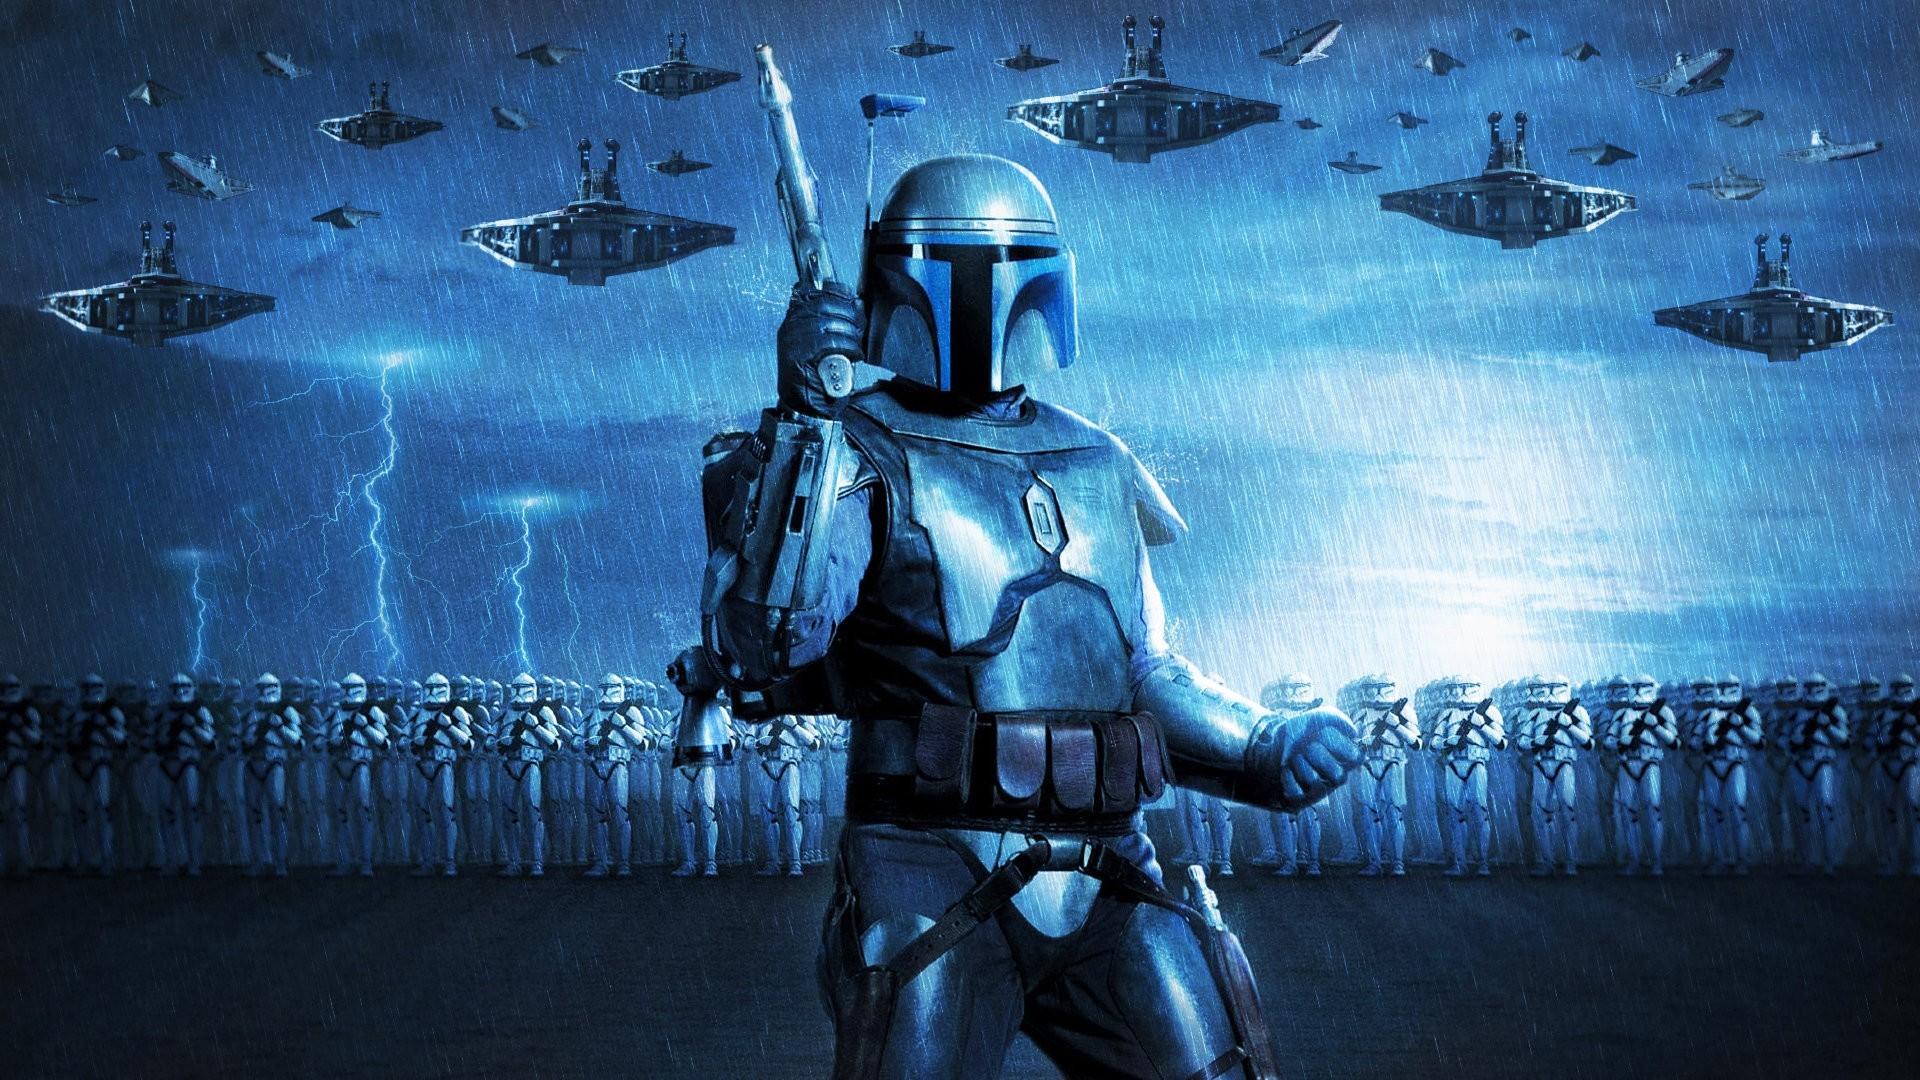 General Star Wars Jango Fett Star Wars: Episode II – Attack of  the Clones